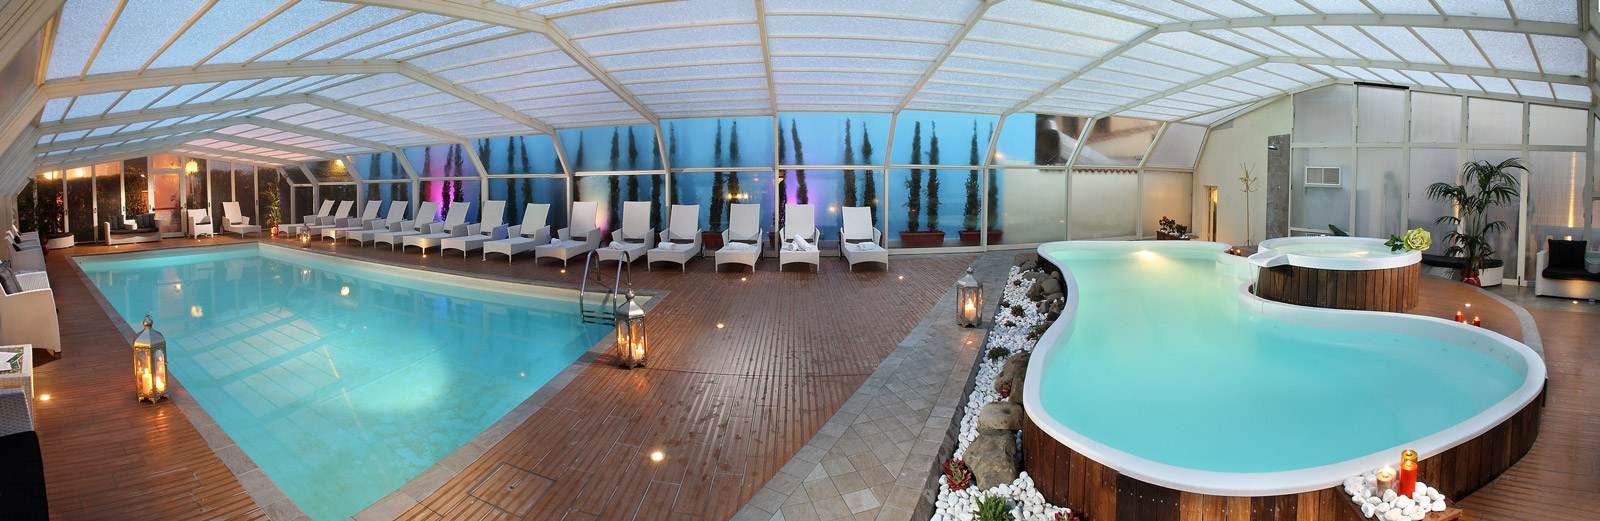 Family Hotel Montecatini Terme